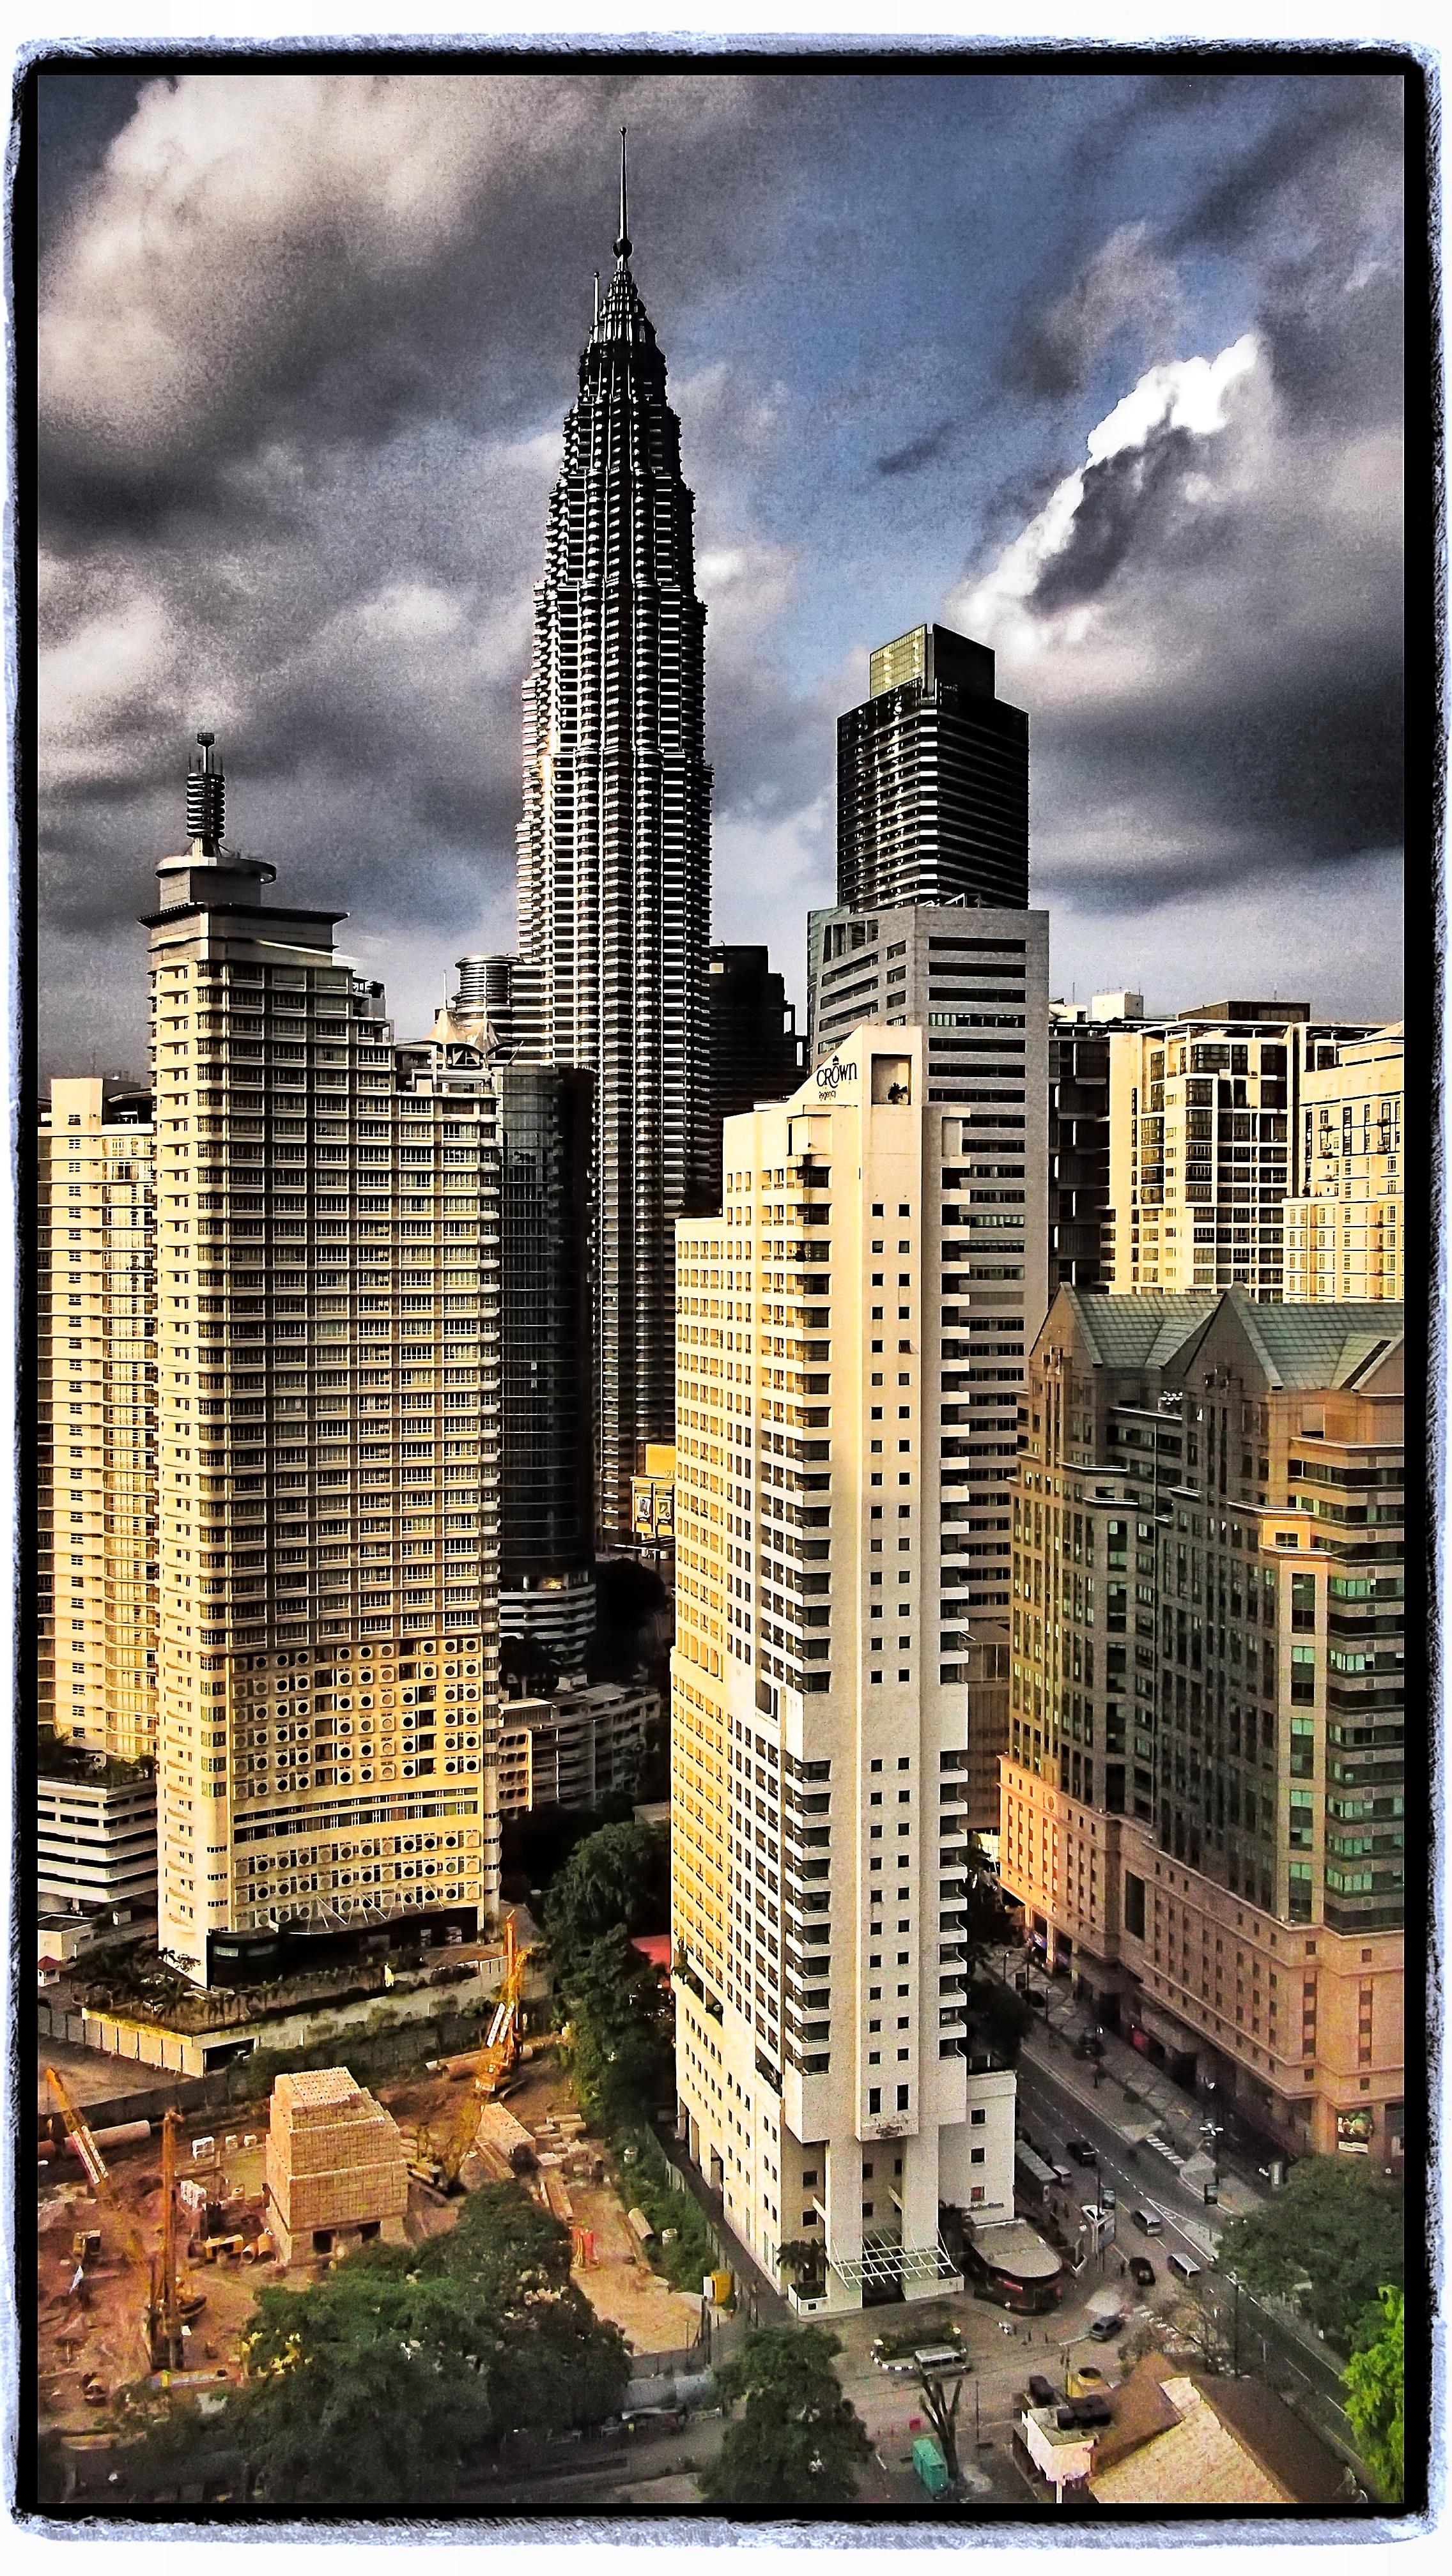 Sequence Kuala Lumpur: from Shangri-La May12 EP3/14mm